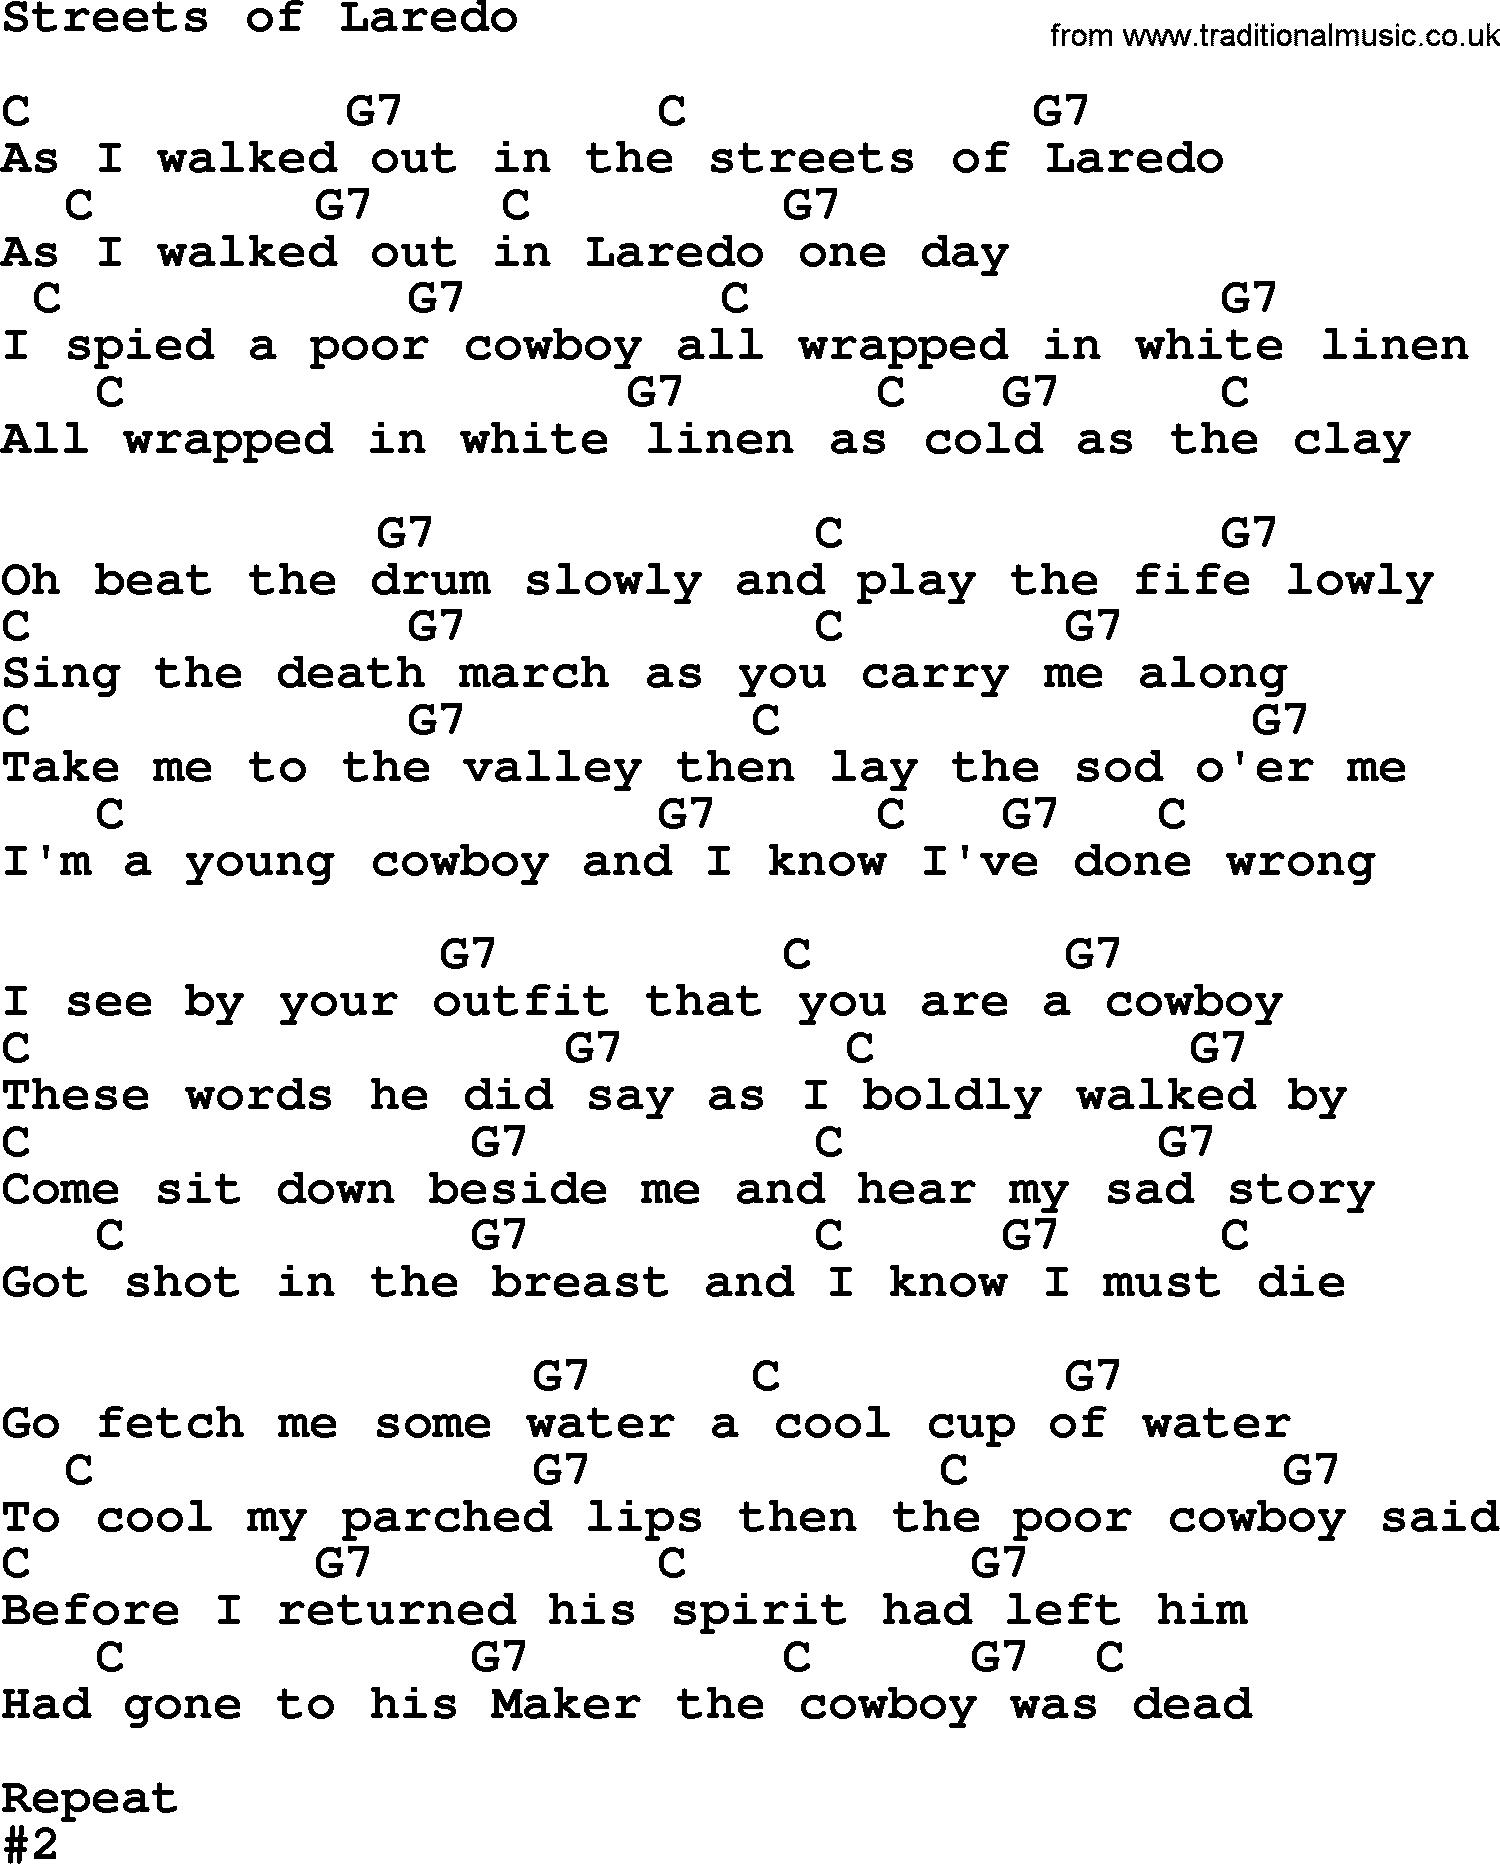 Marty Robbins Song Streets Of Laredo Lyrics And Chords Mary